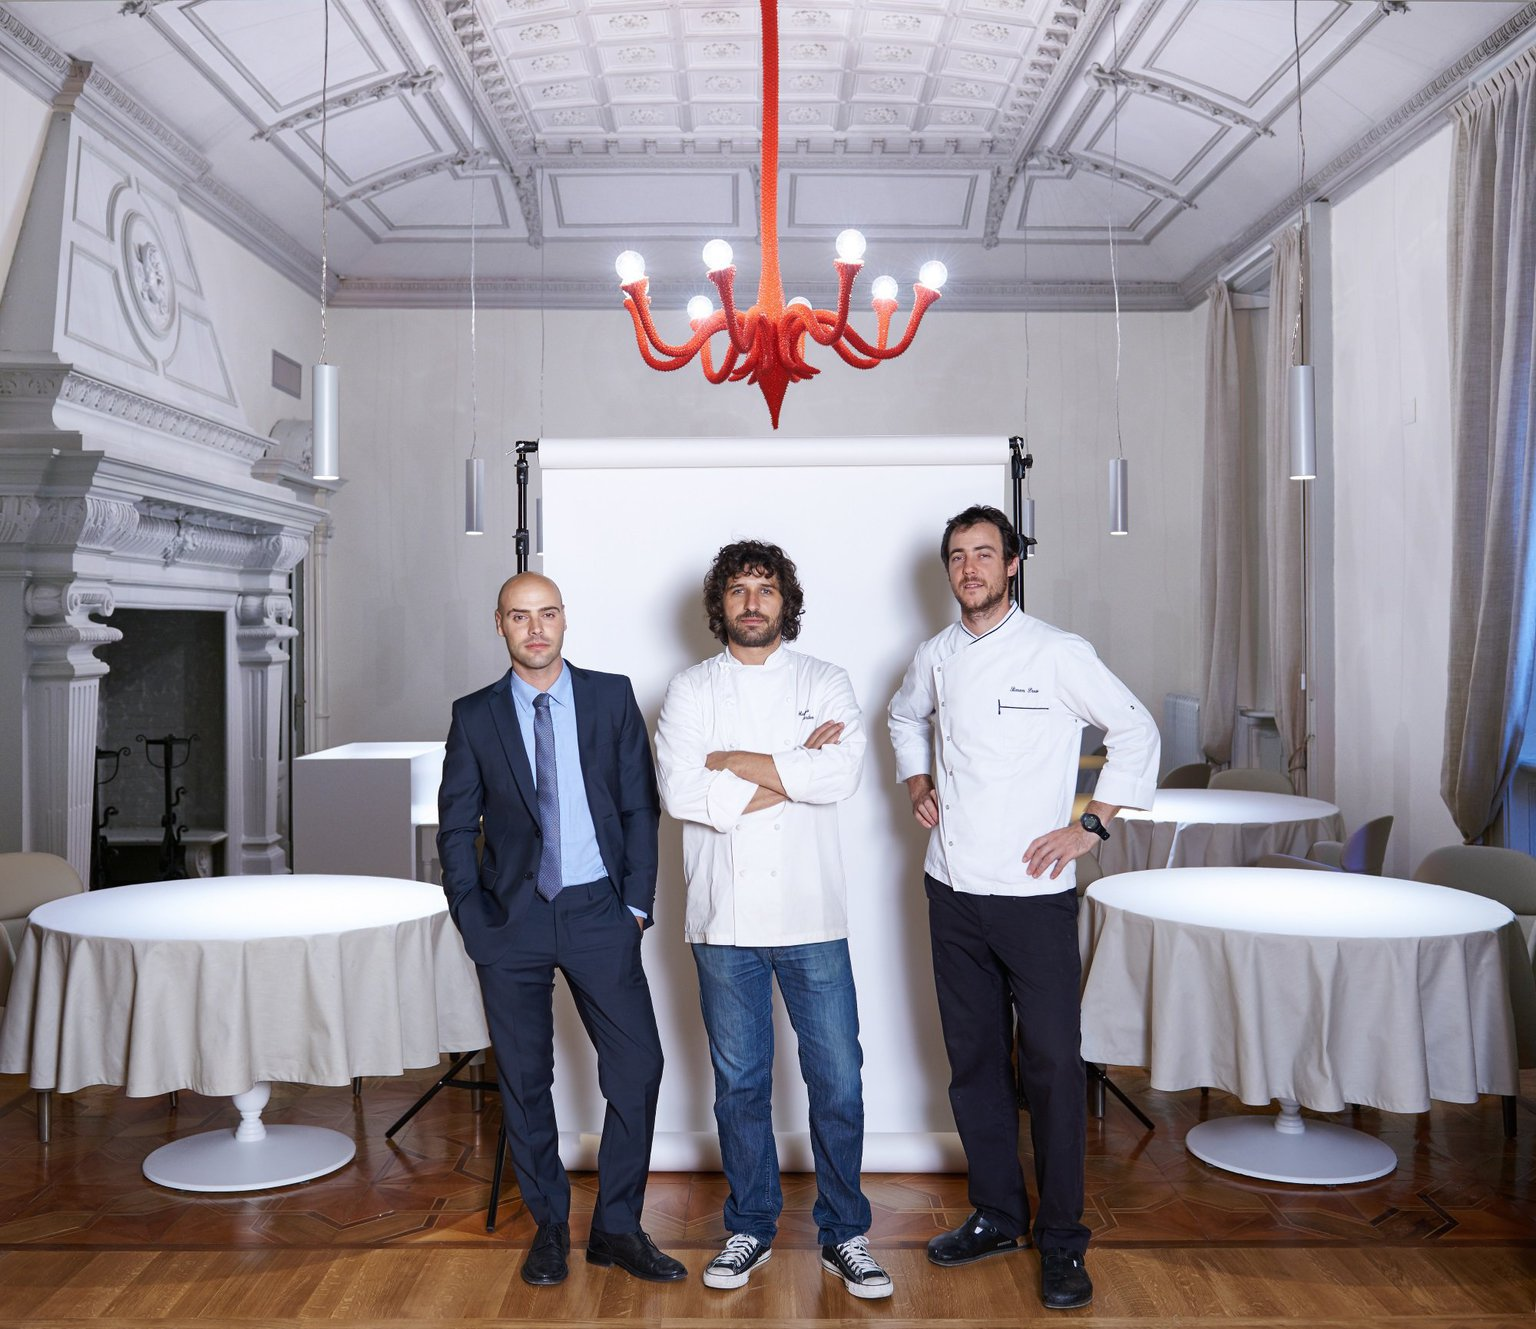 Contraste, lo staff:  (da sinistra) Thomas Piras, Matias Perdomo, Simon Press